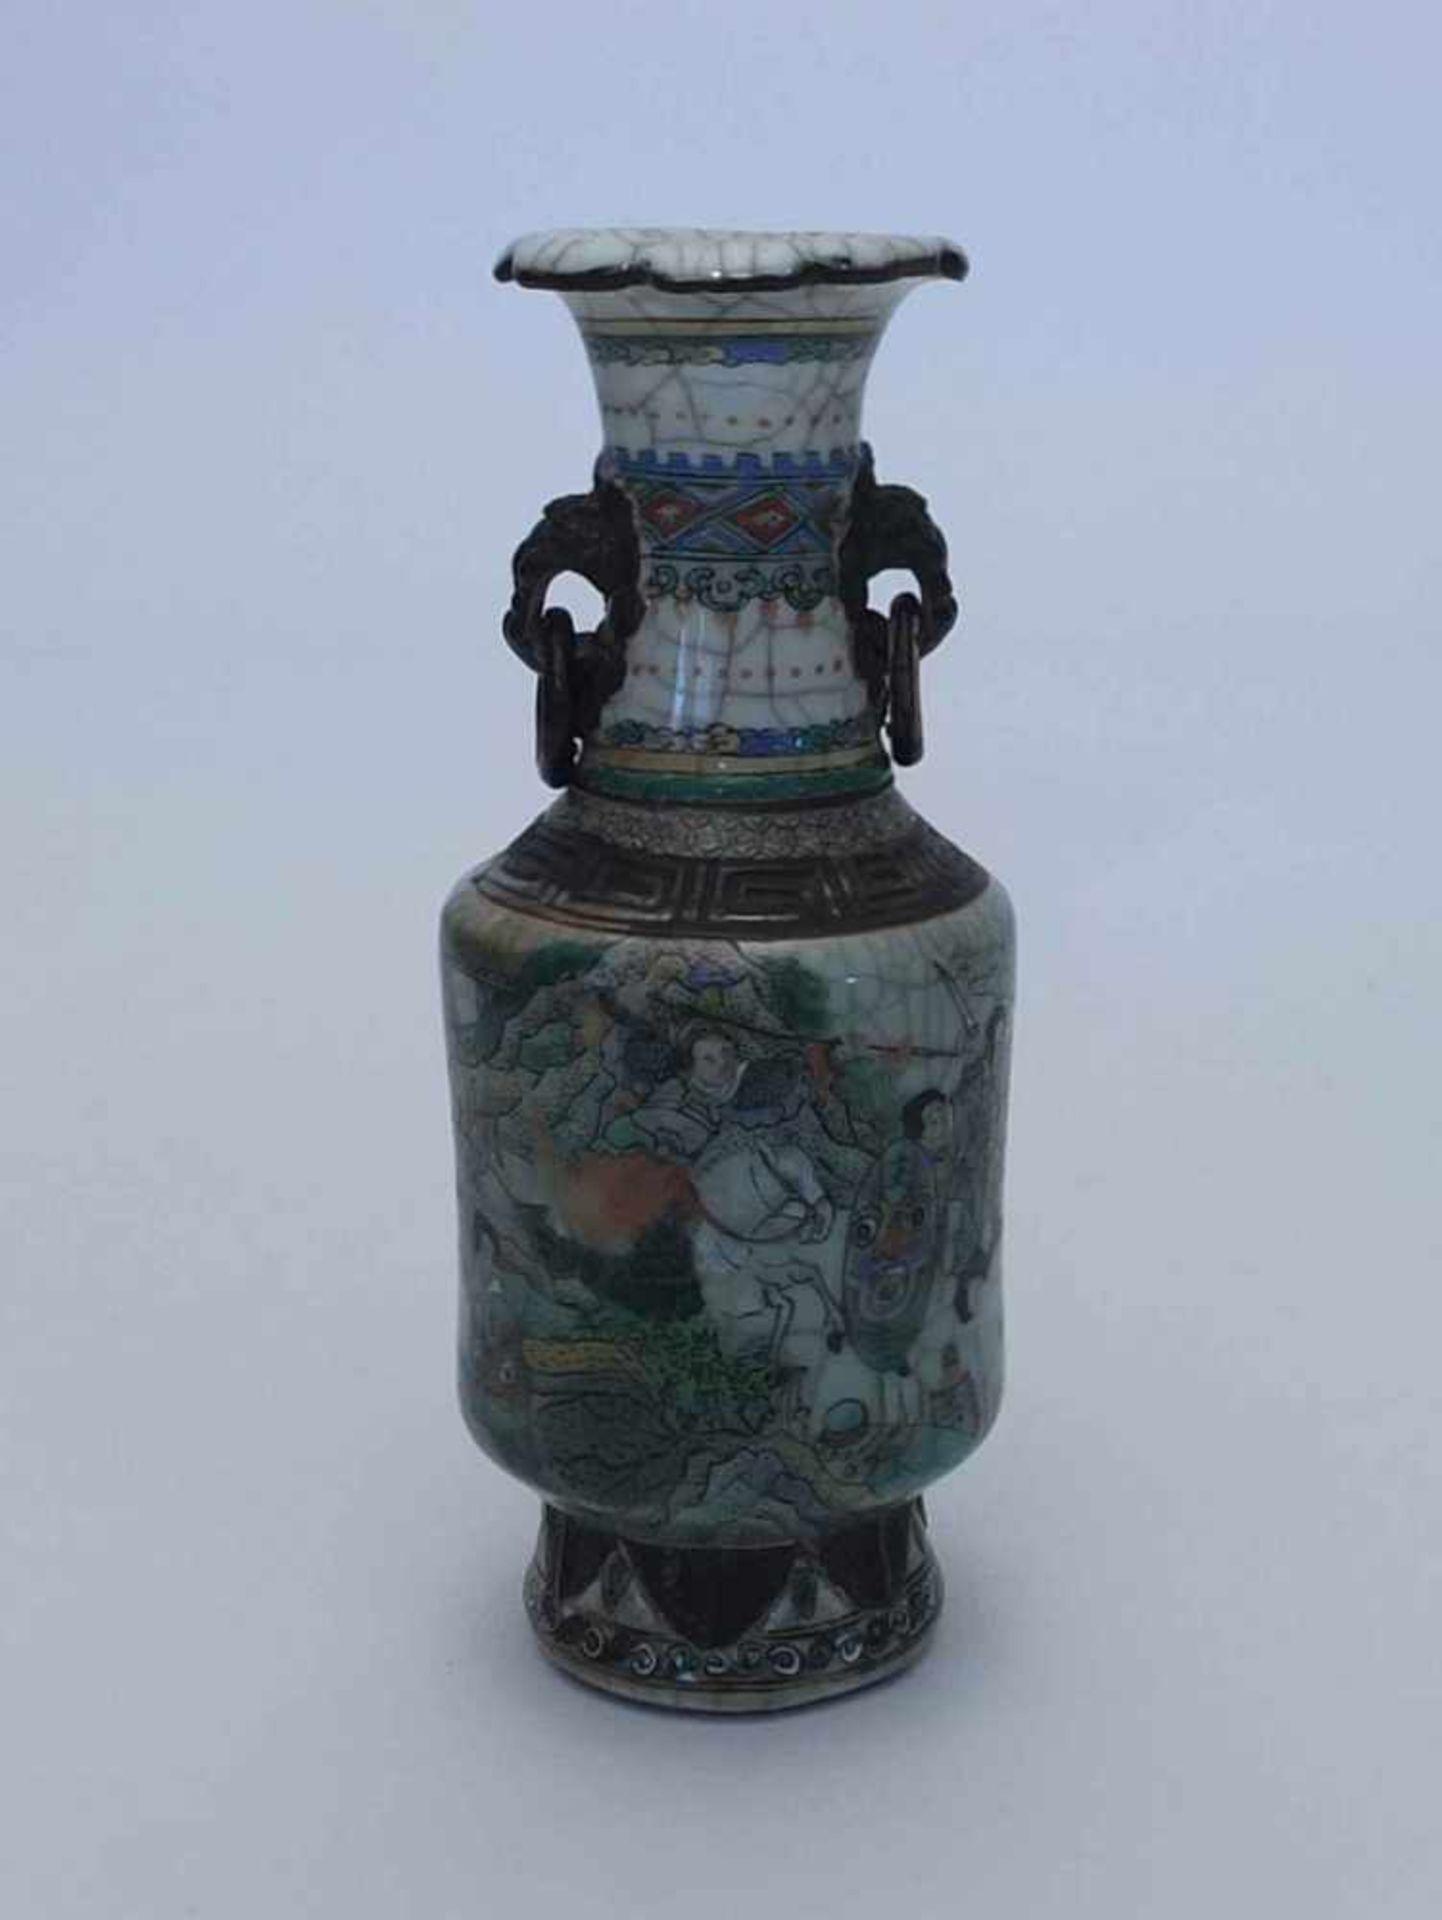 VASE, China, Marke Cheng huanian zhi (?), Porzellan, polychrom emailliert, Kunstkrakelee, braun - Bild 3 aus 3